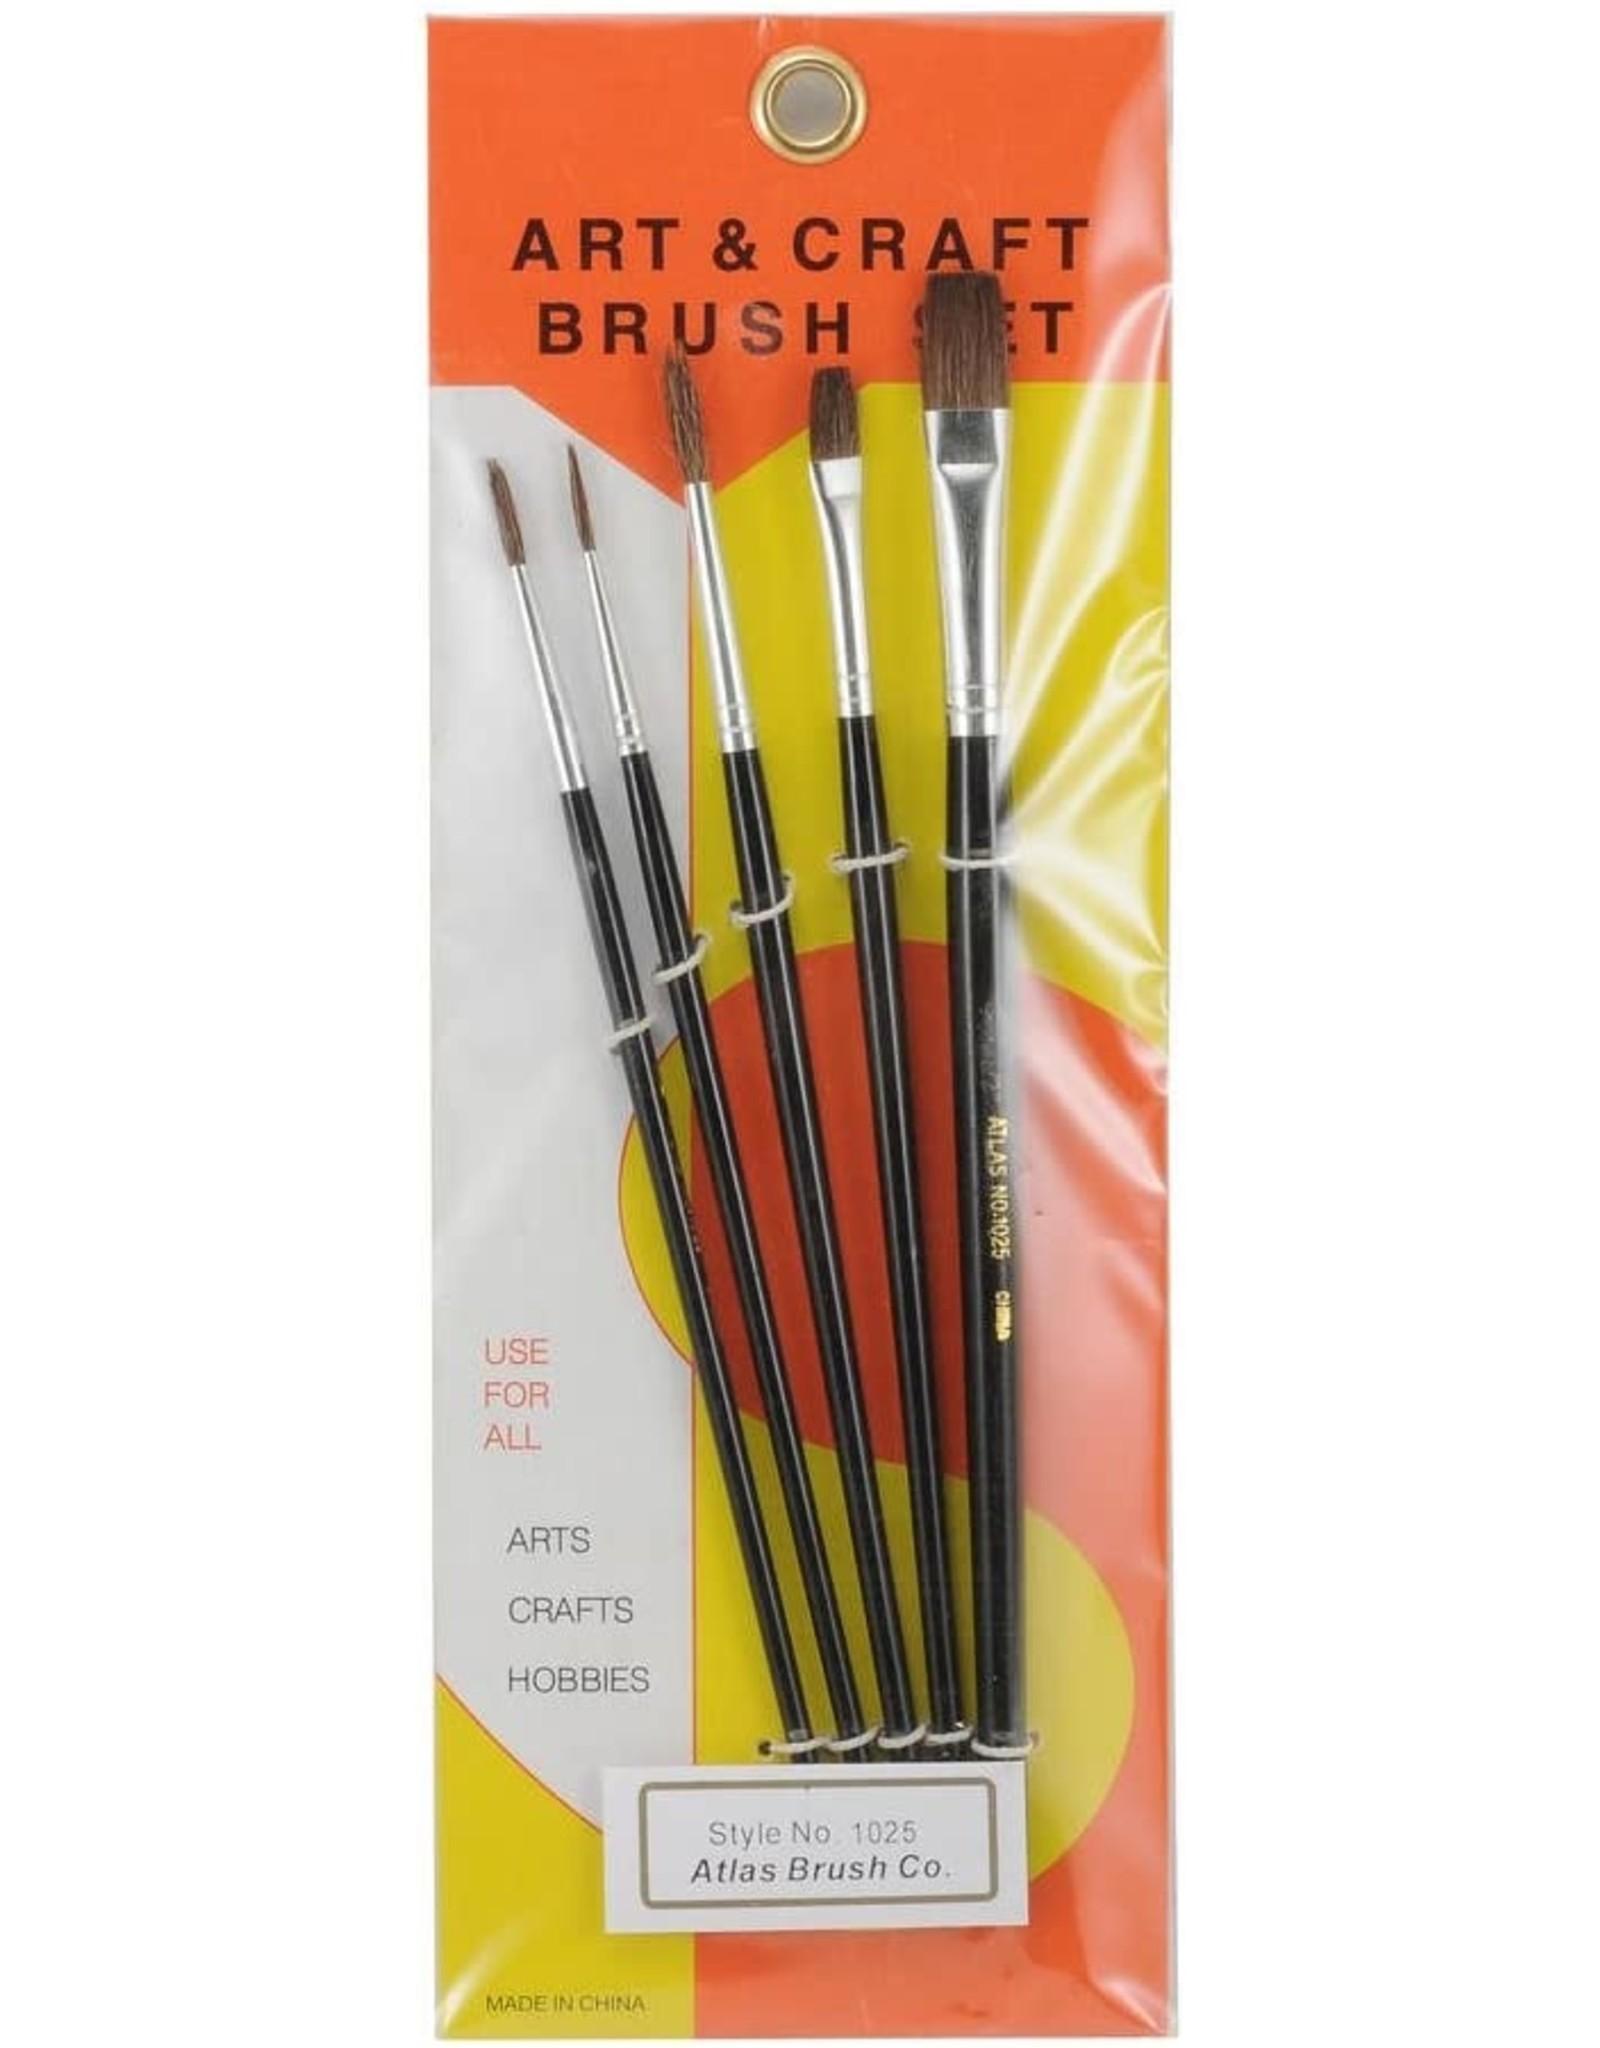 Atlas Brush Co. 1025 - Round and Flat Camel Hair 5 Piece Brush Set